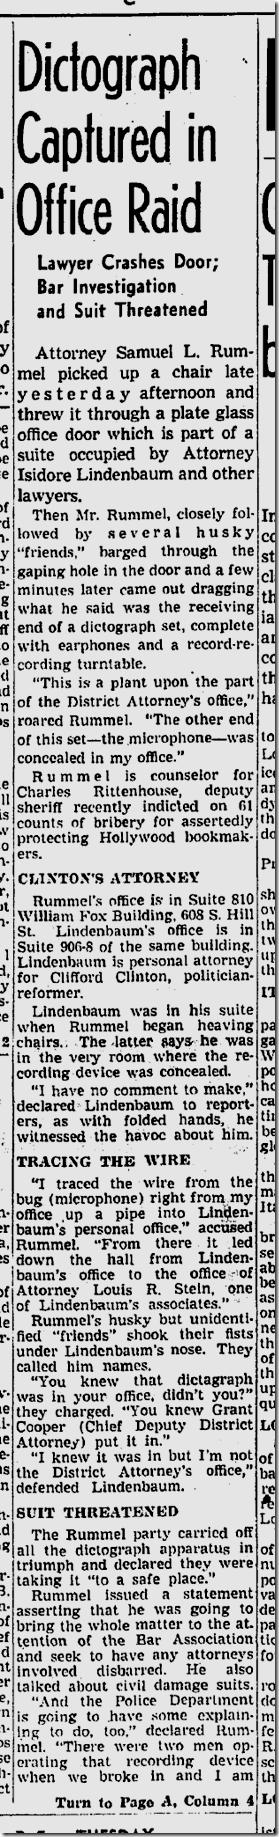 July 15, 1941, Sam Rummel